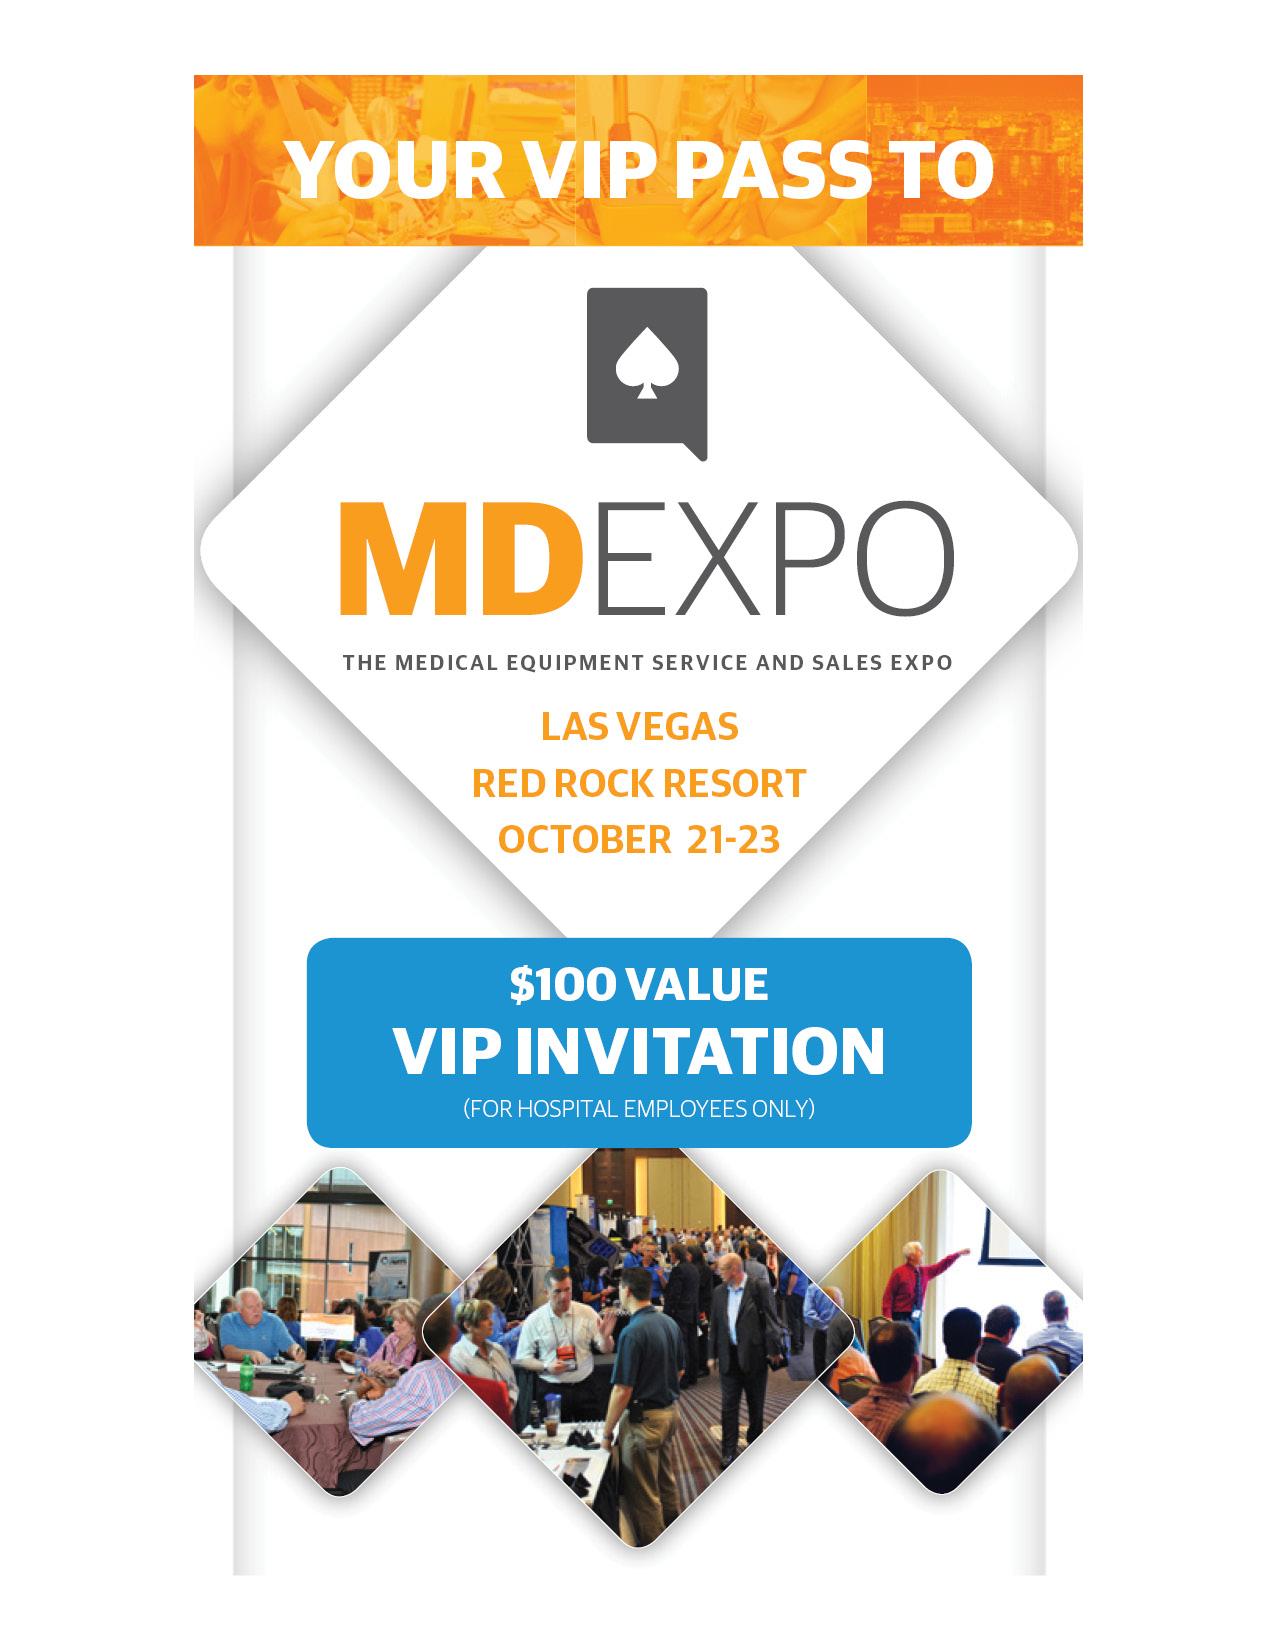 free-vip-pass-md-expo-image.jpg